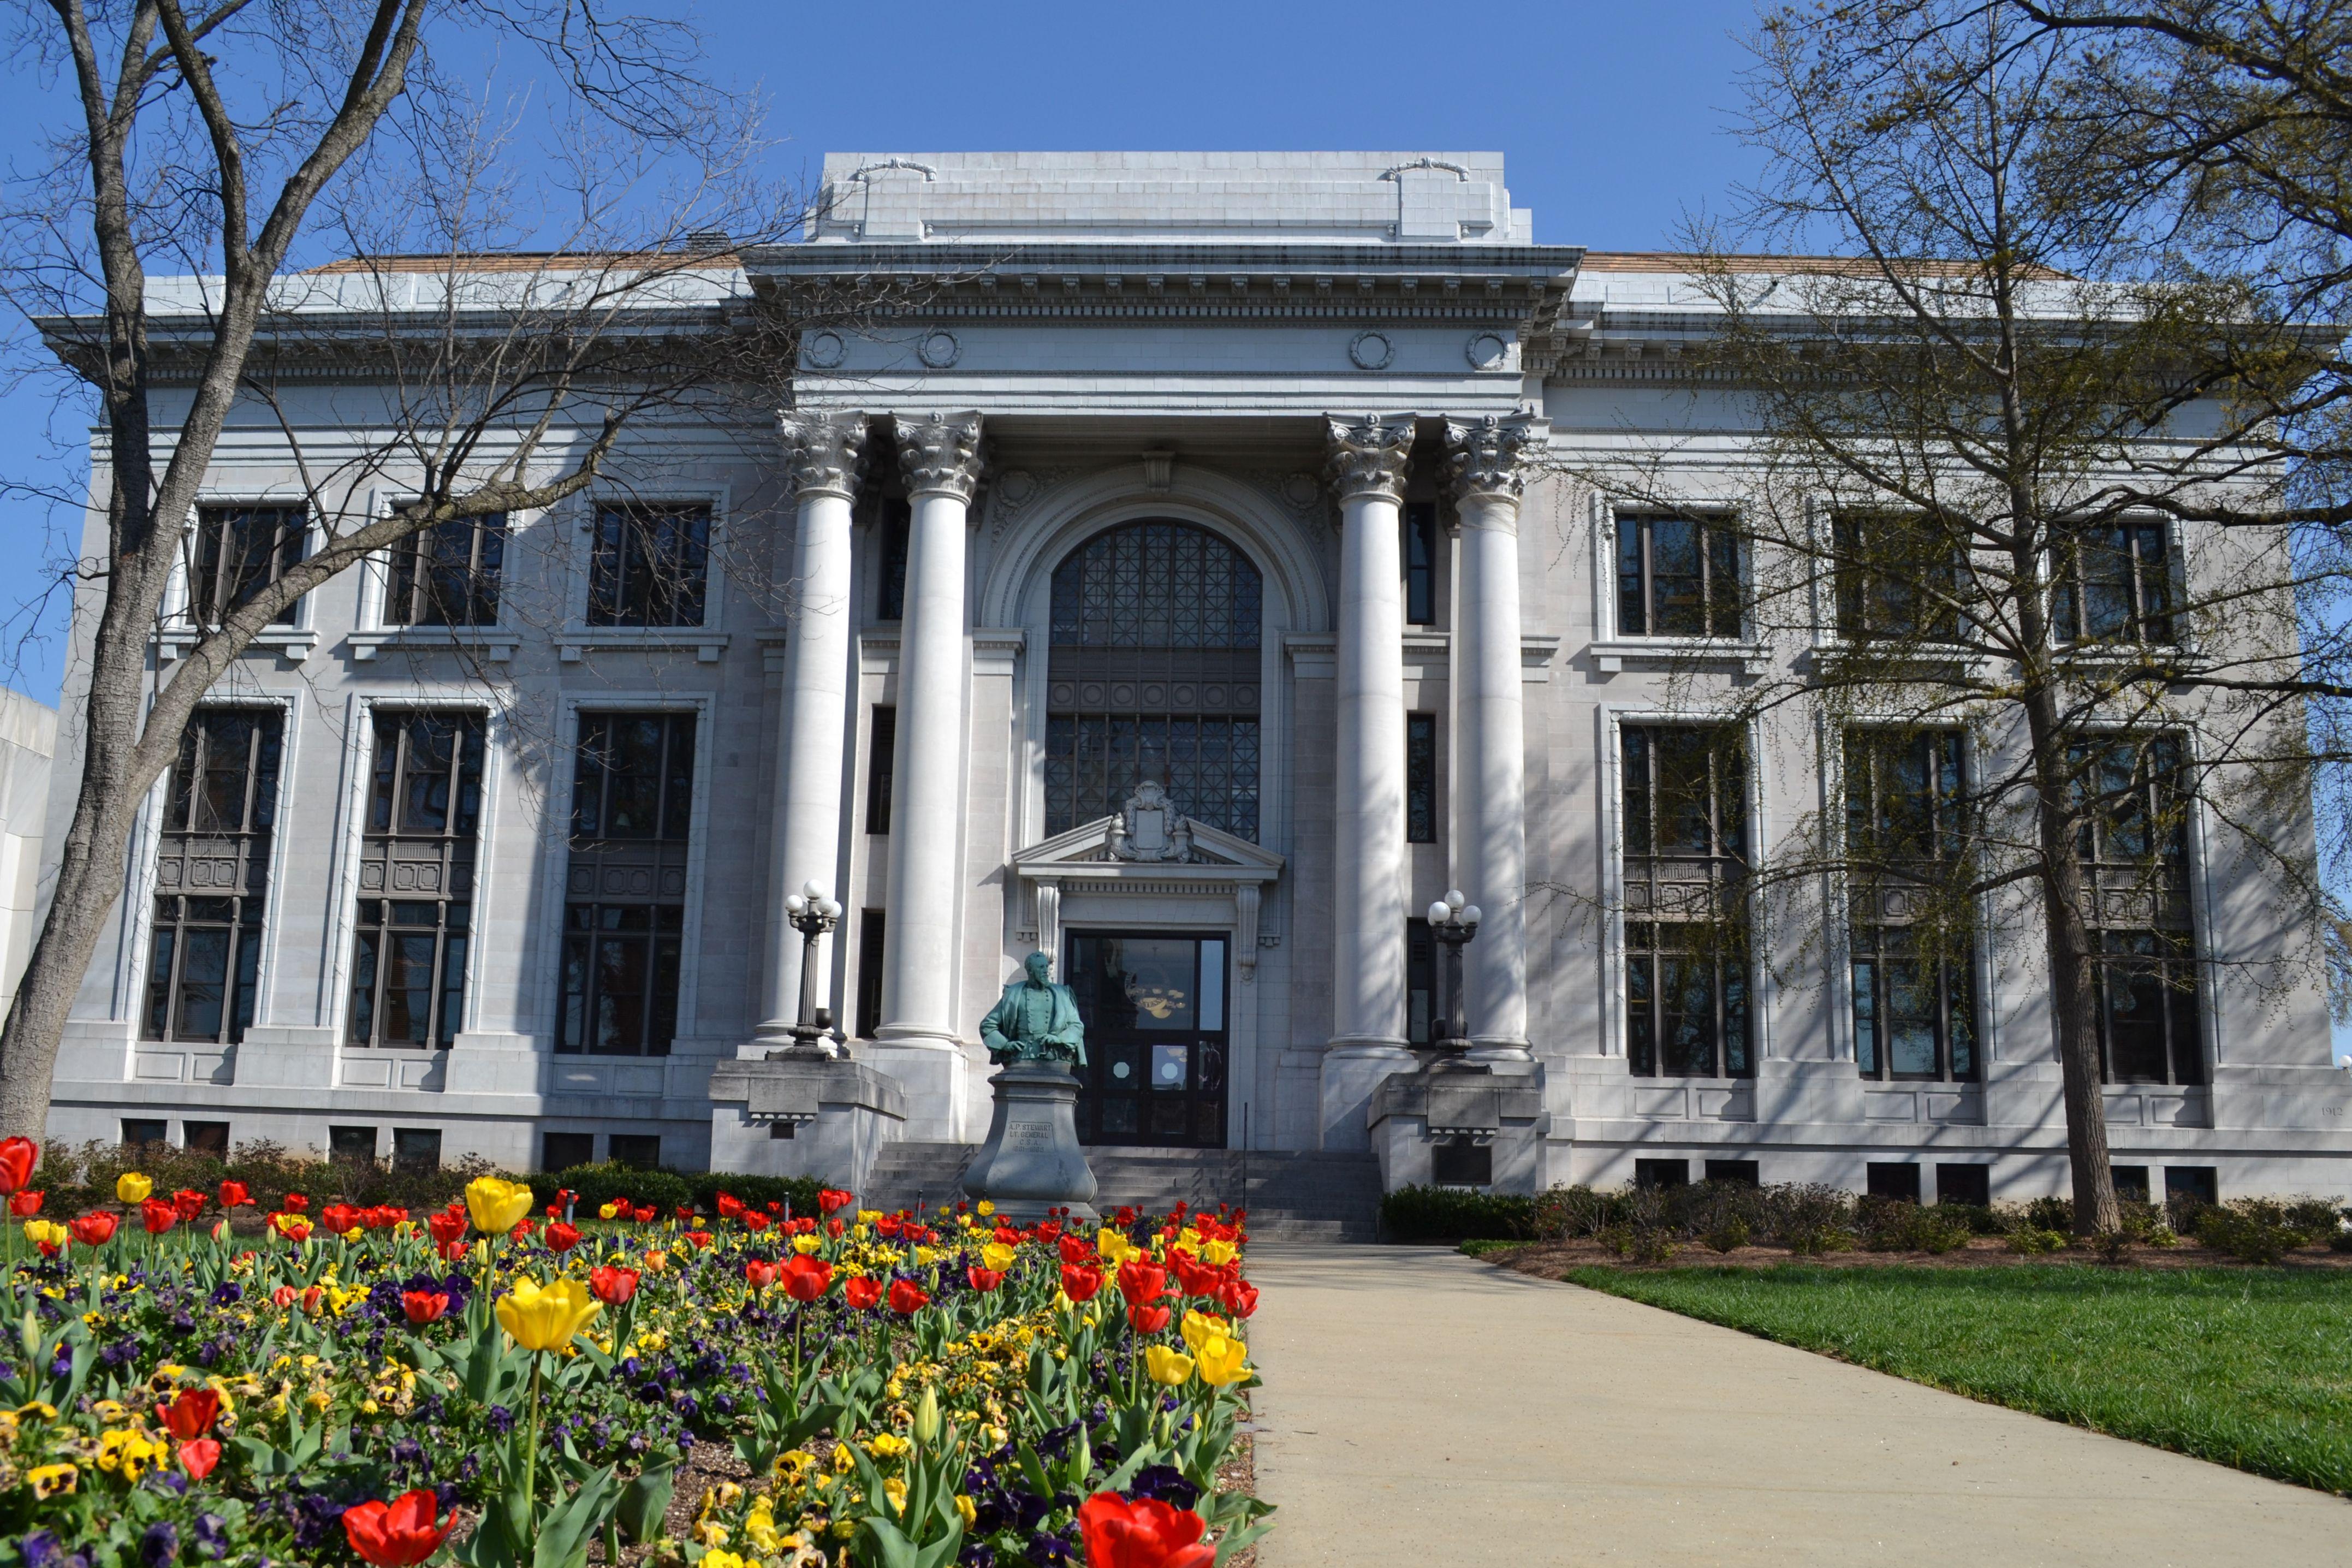 Court date in Hamilton